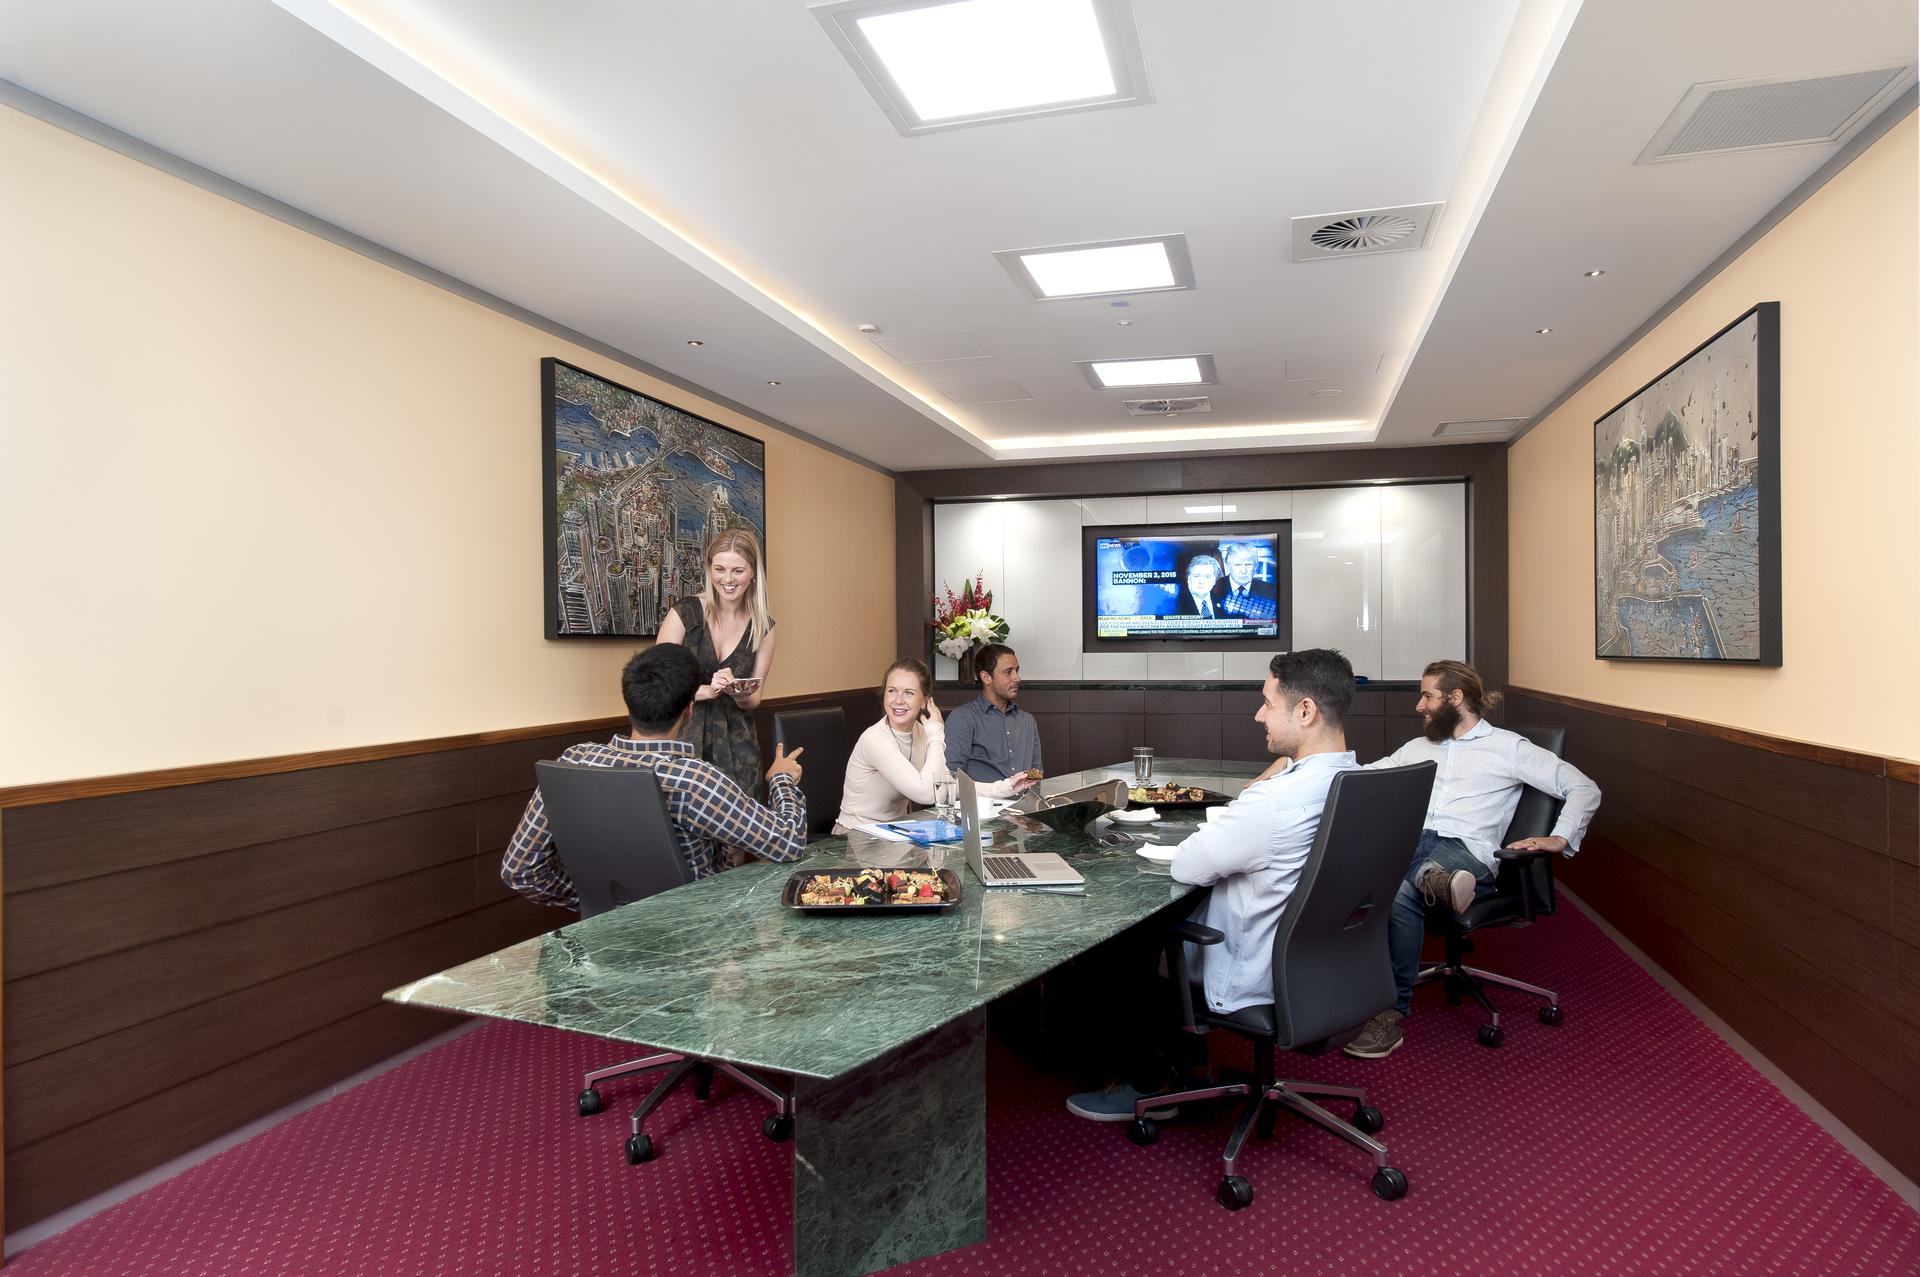 OFFICES IN SYDNEY'S LANDMARK BUILDING AT CIRCULAR QUAY.